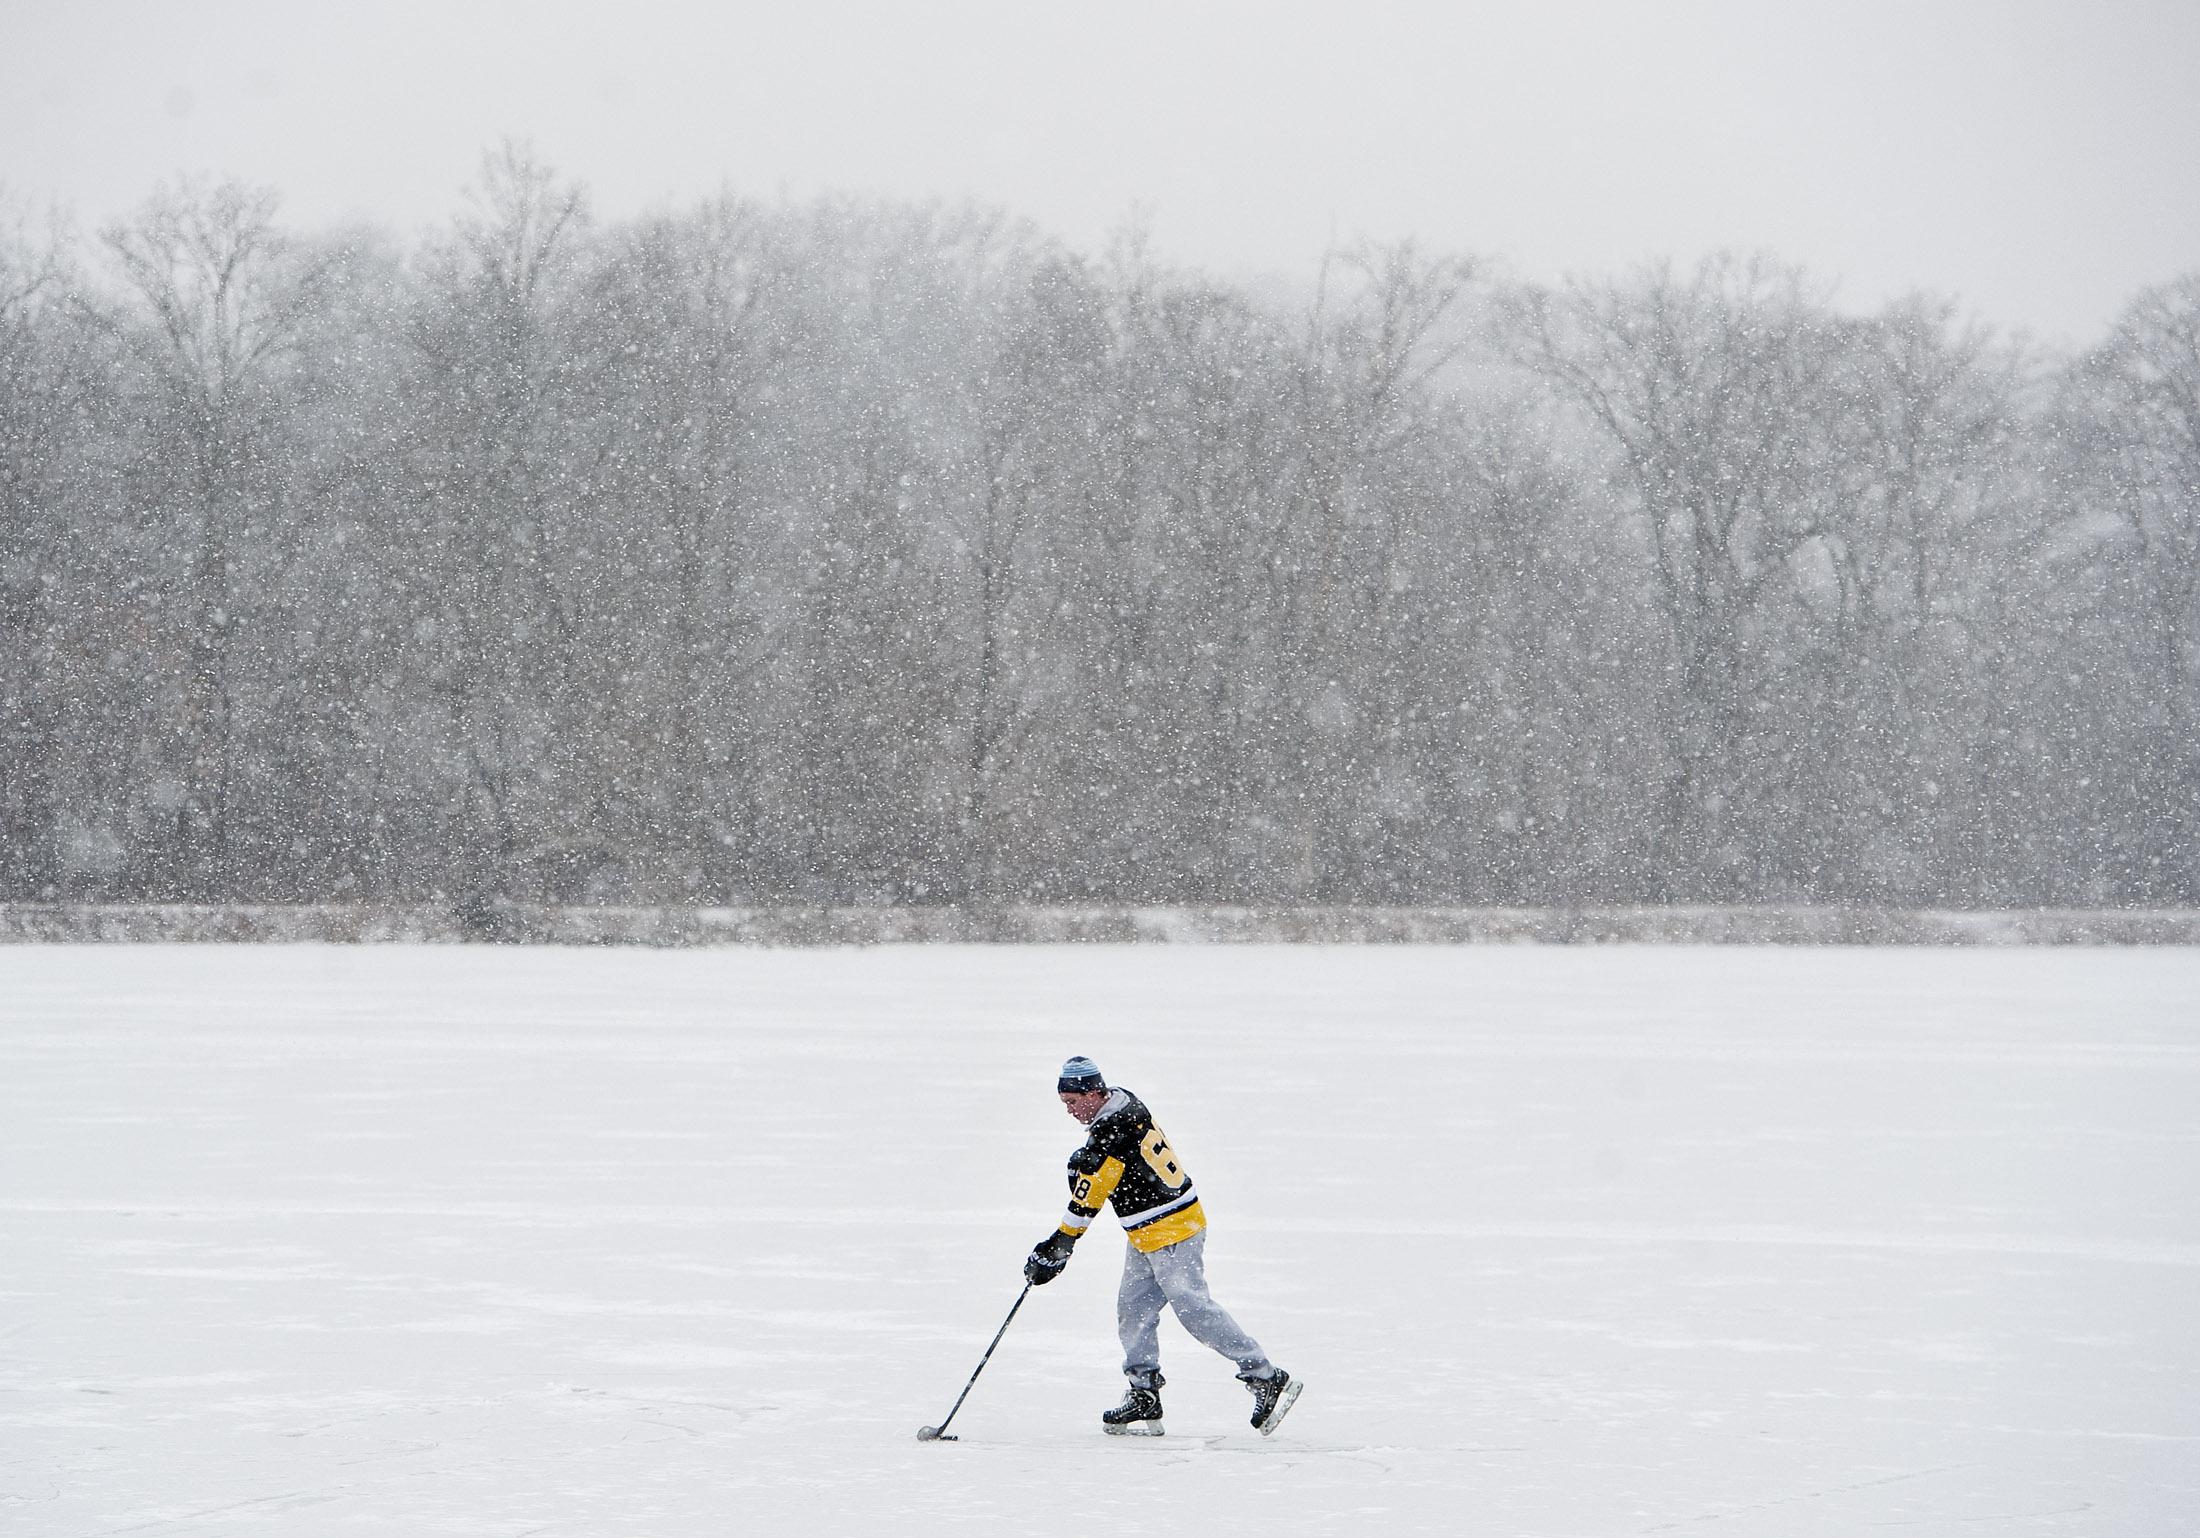 Connor Kok of Latrobe, a freshman student at Seton Hill University, plays hockey on a pond near St. Vincent College on Wednesday, Jan. 20, 2016. Kok's childhood idol was former Pittsburgh Penguin Jaromír Jágr.